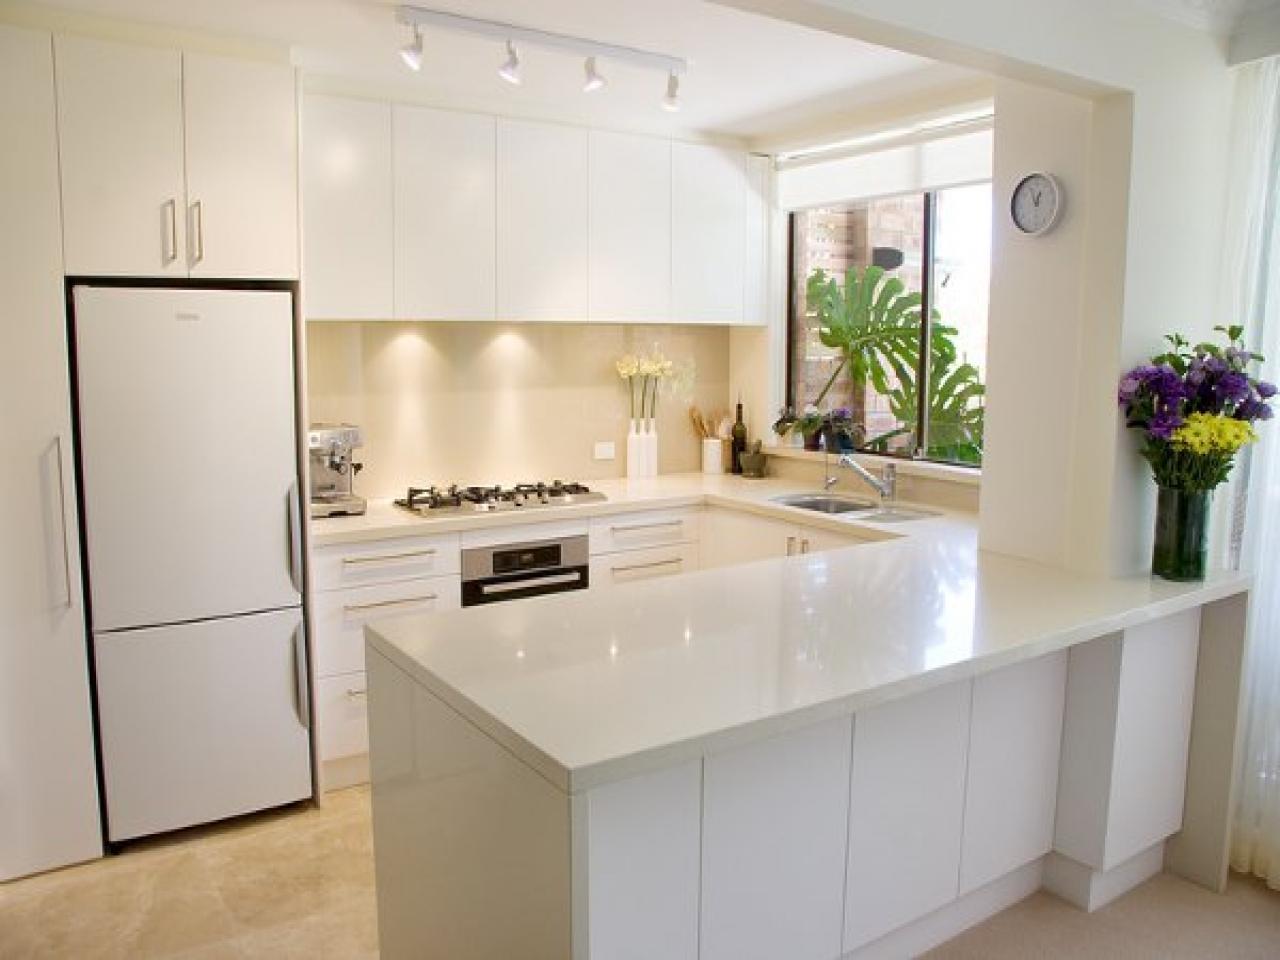 home depot kitchen design ideas photo - 10